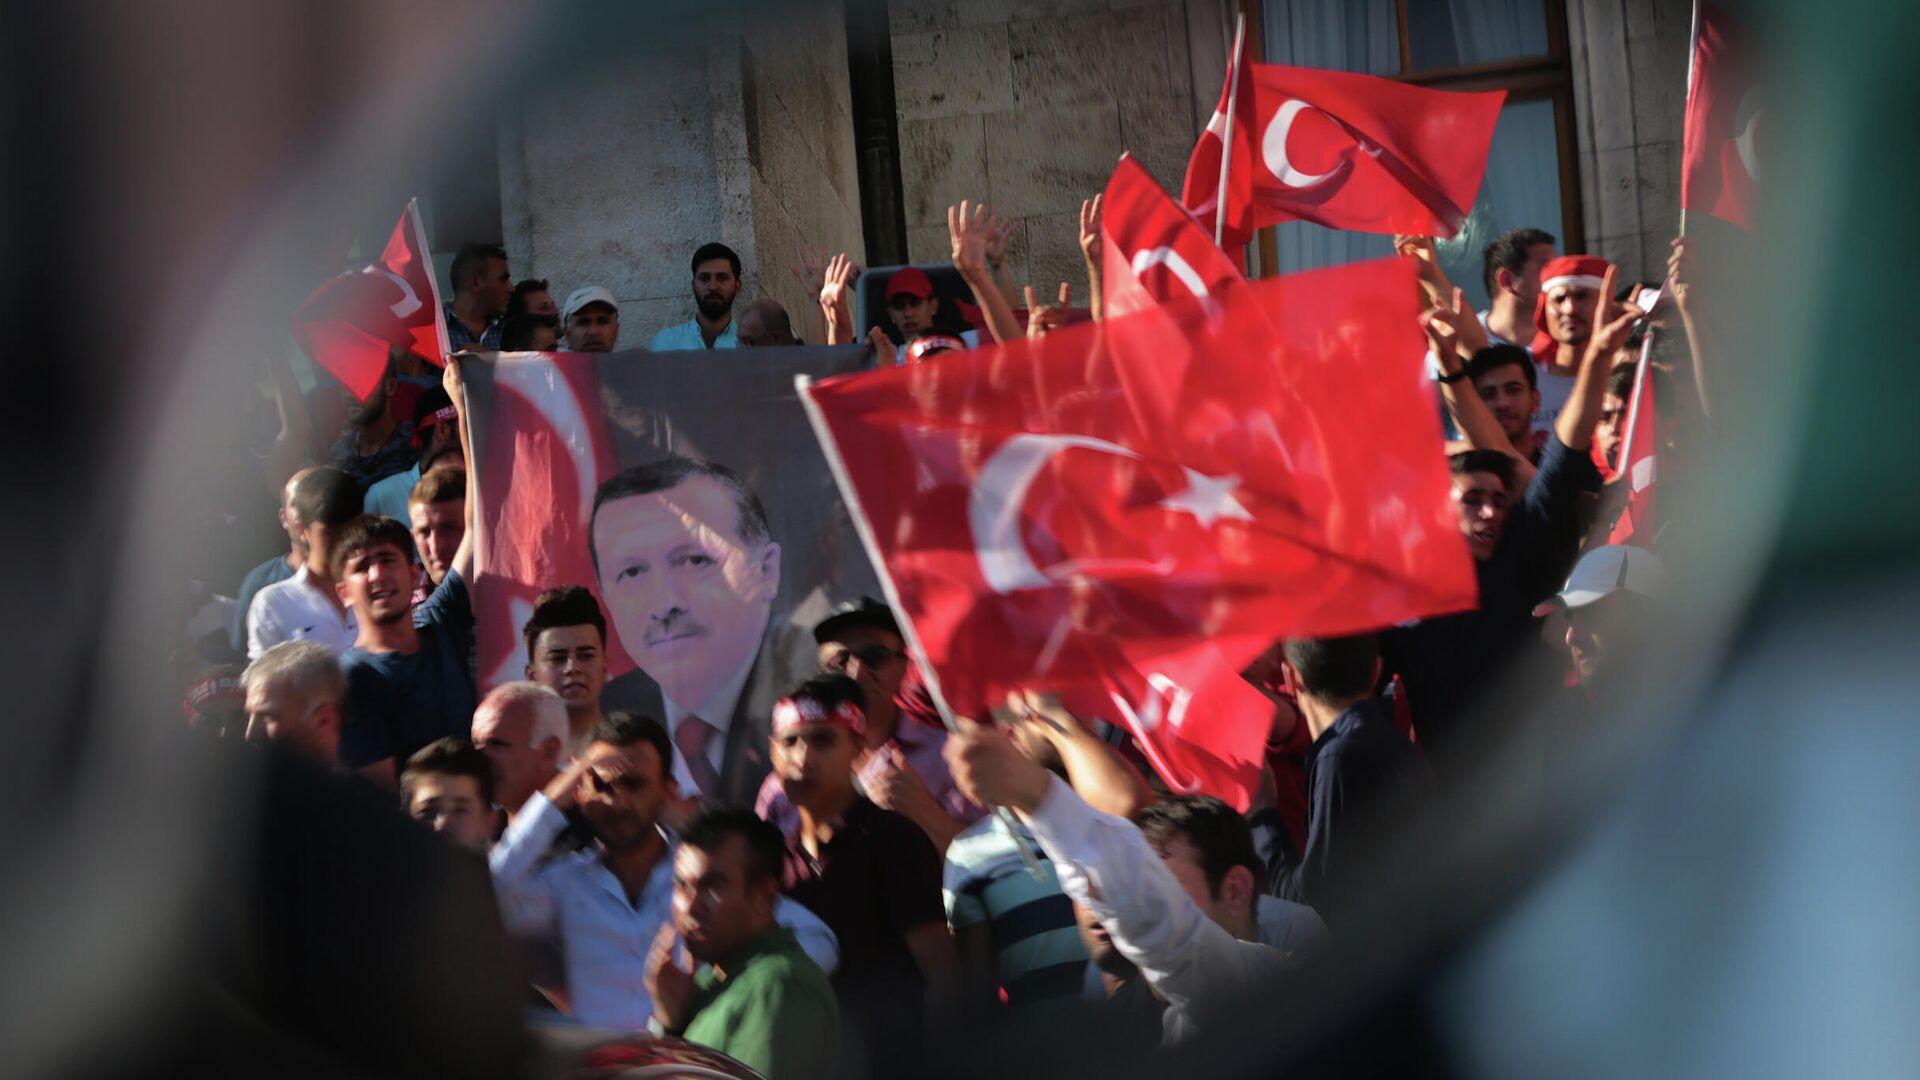 Протест против военного переворота у здания парламента Турции - РИА Новости, 1920, 16.07.2021